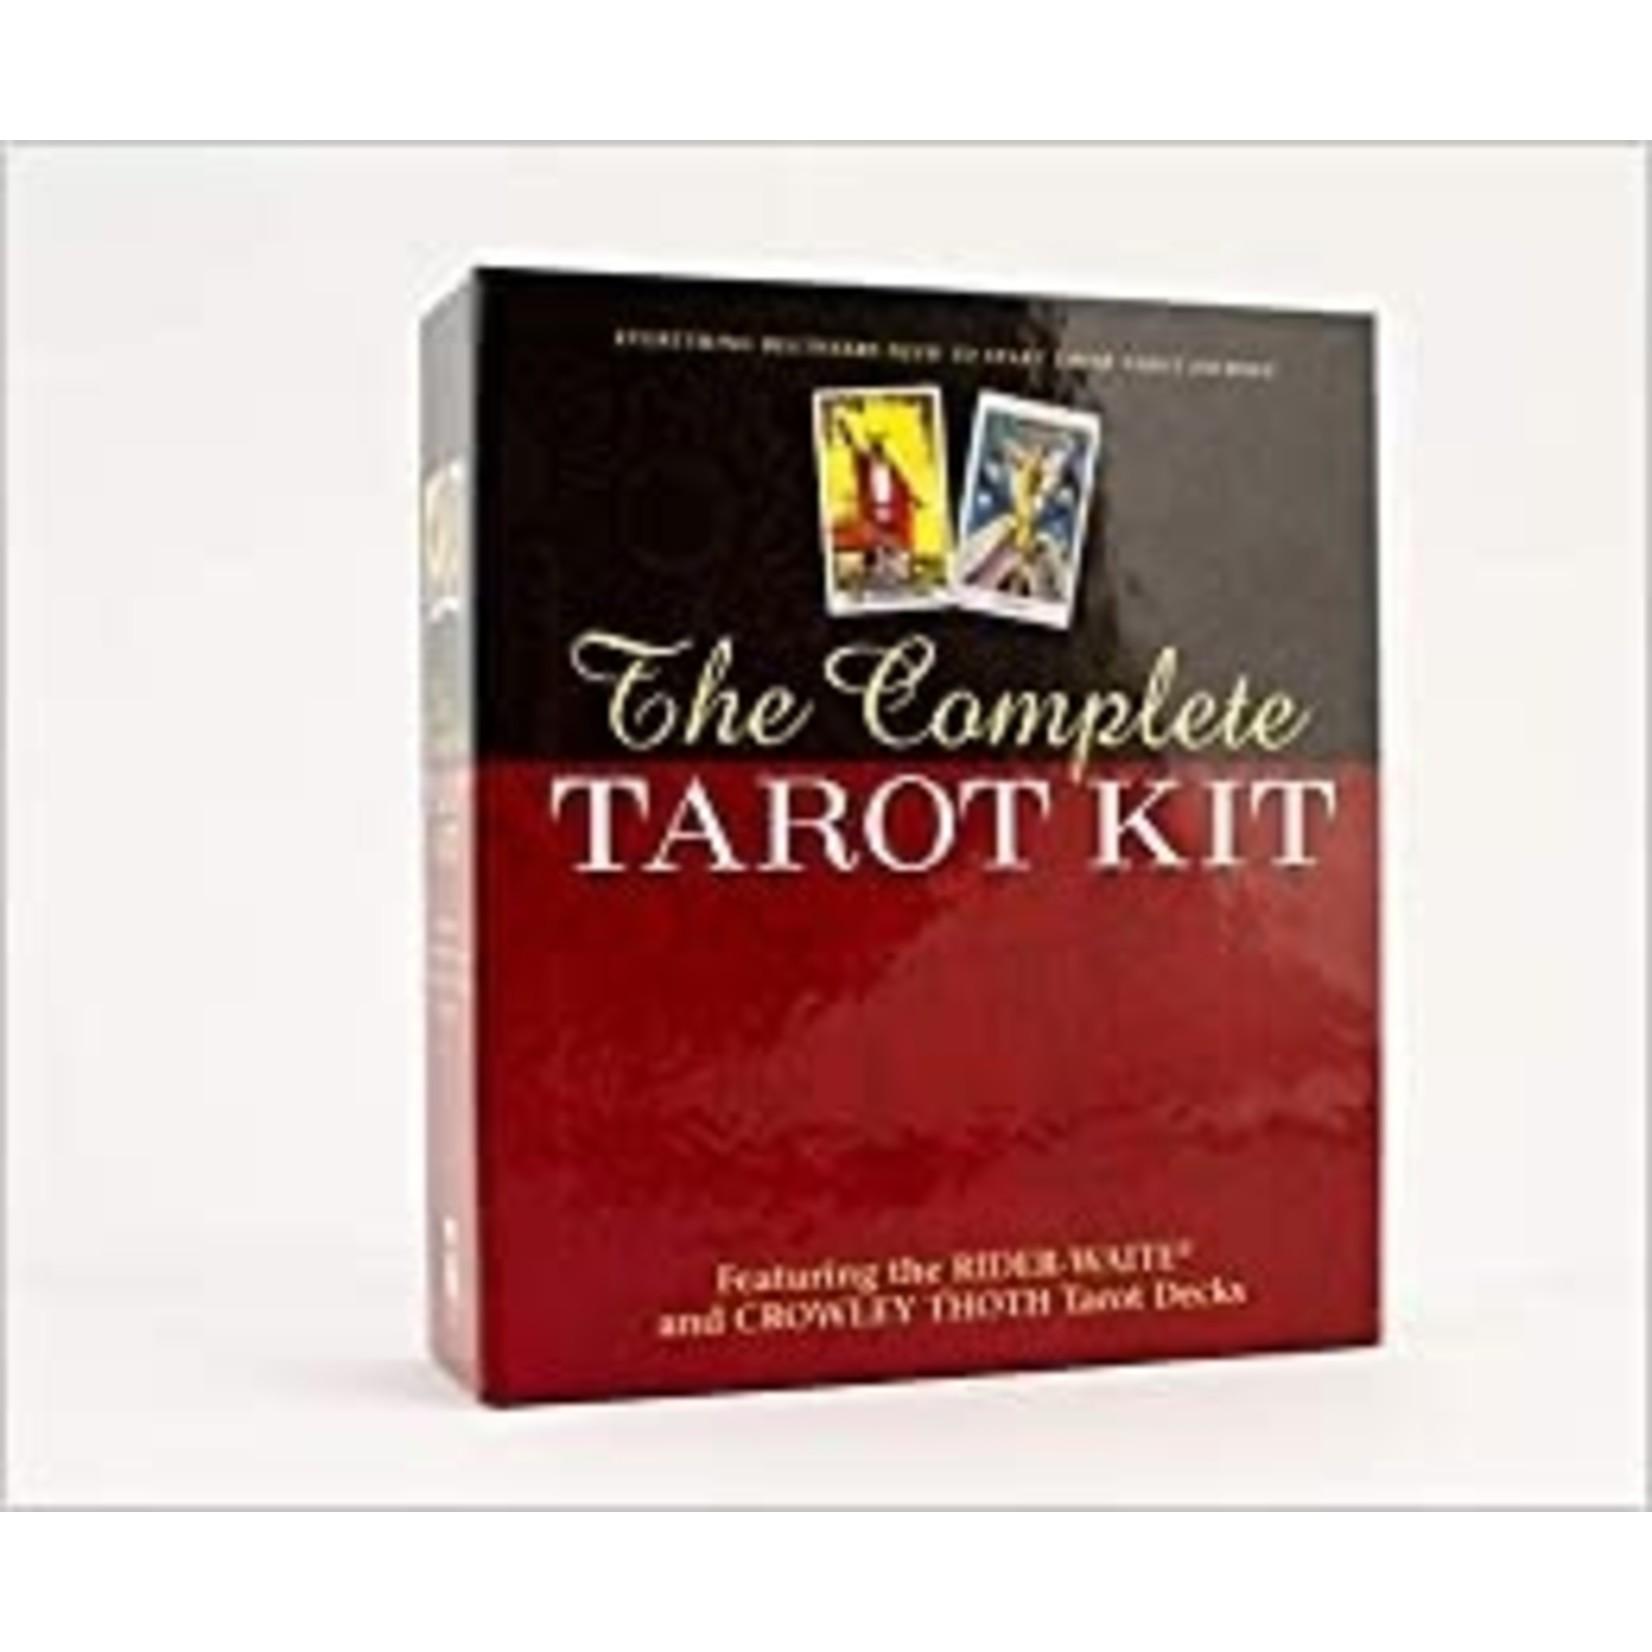 The complete Tarot Kit